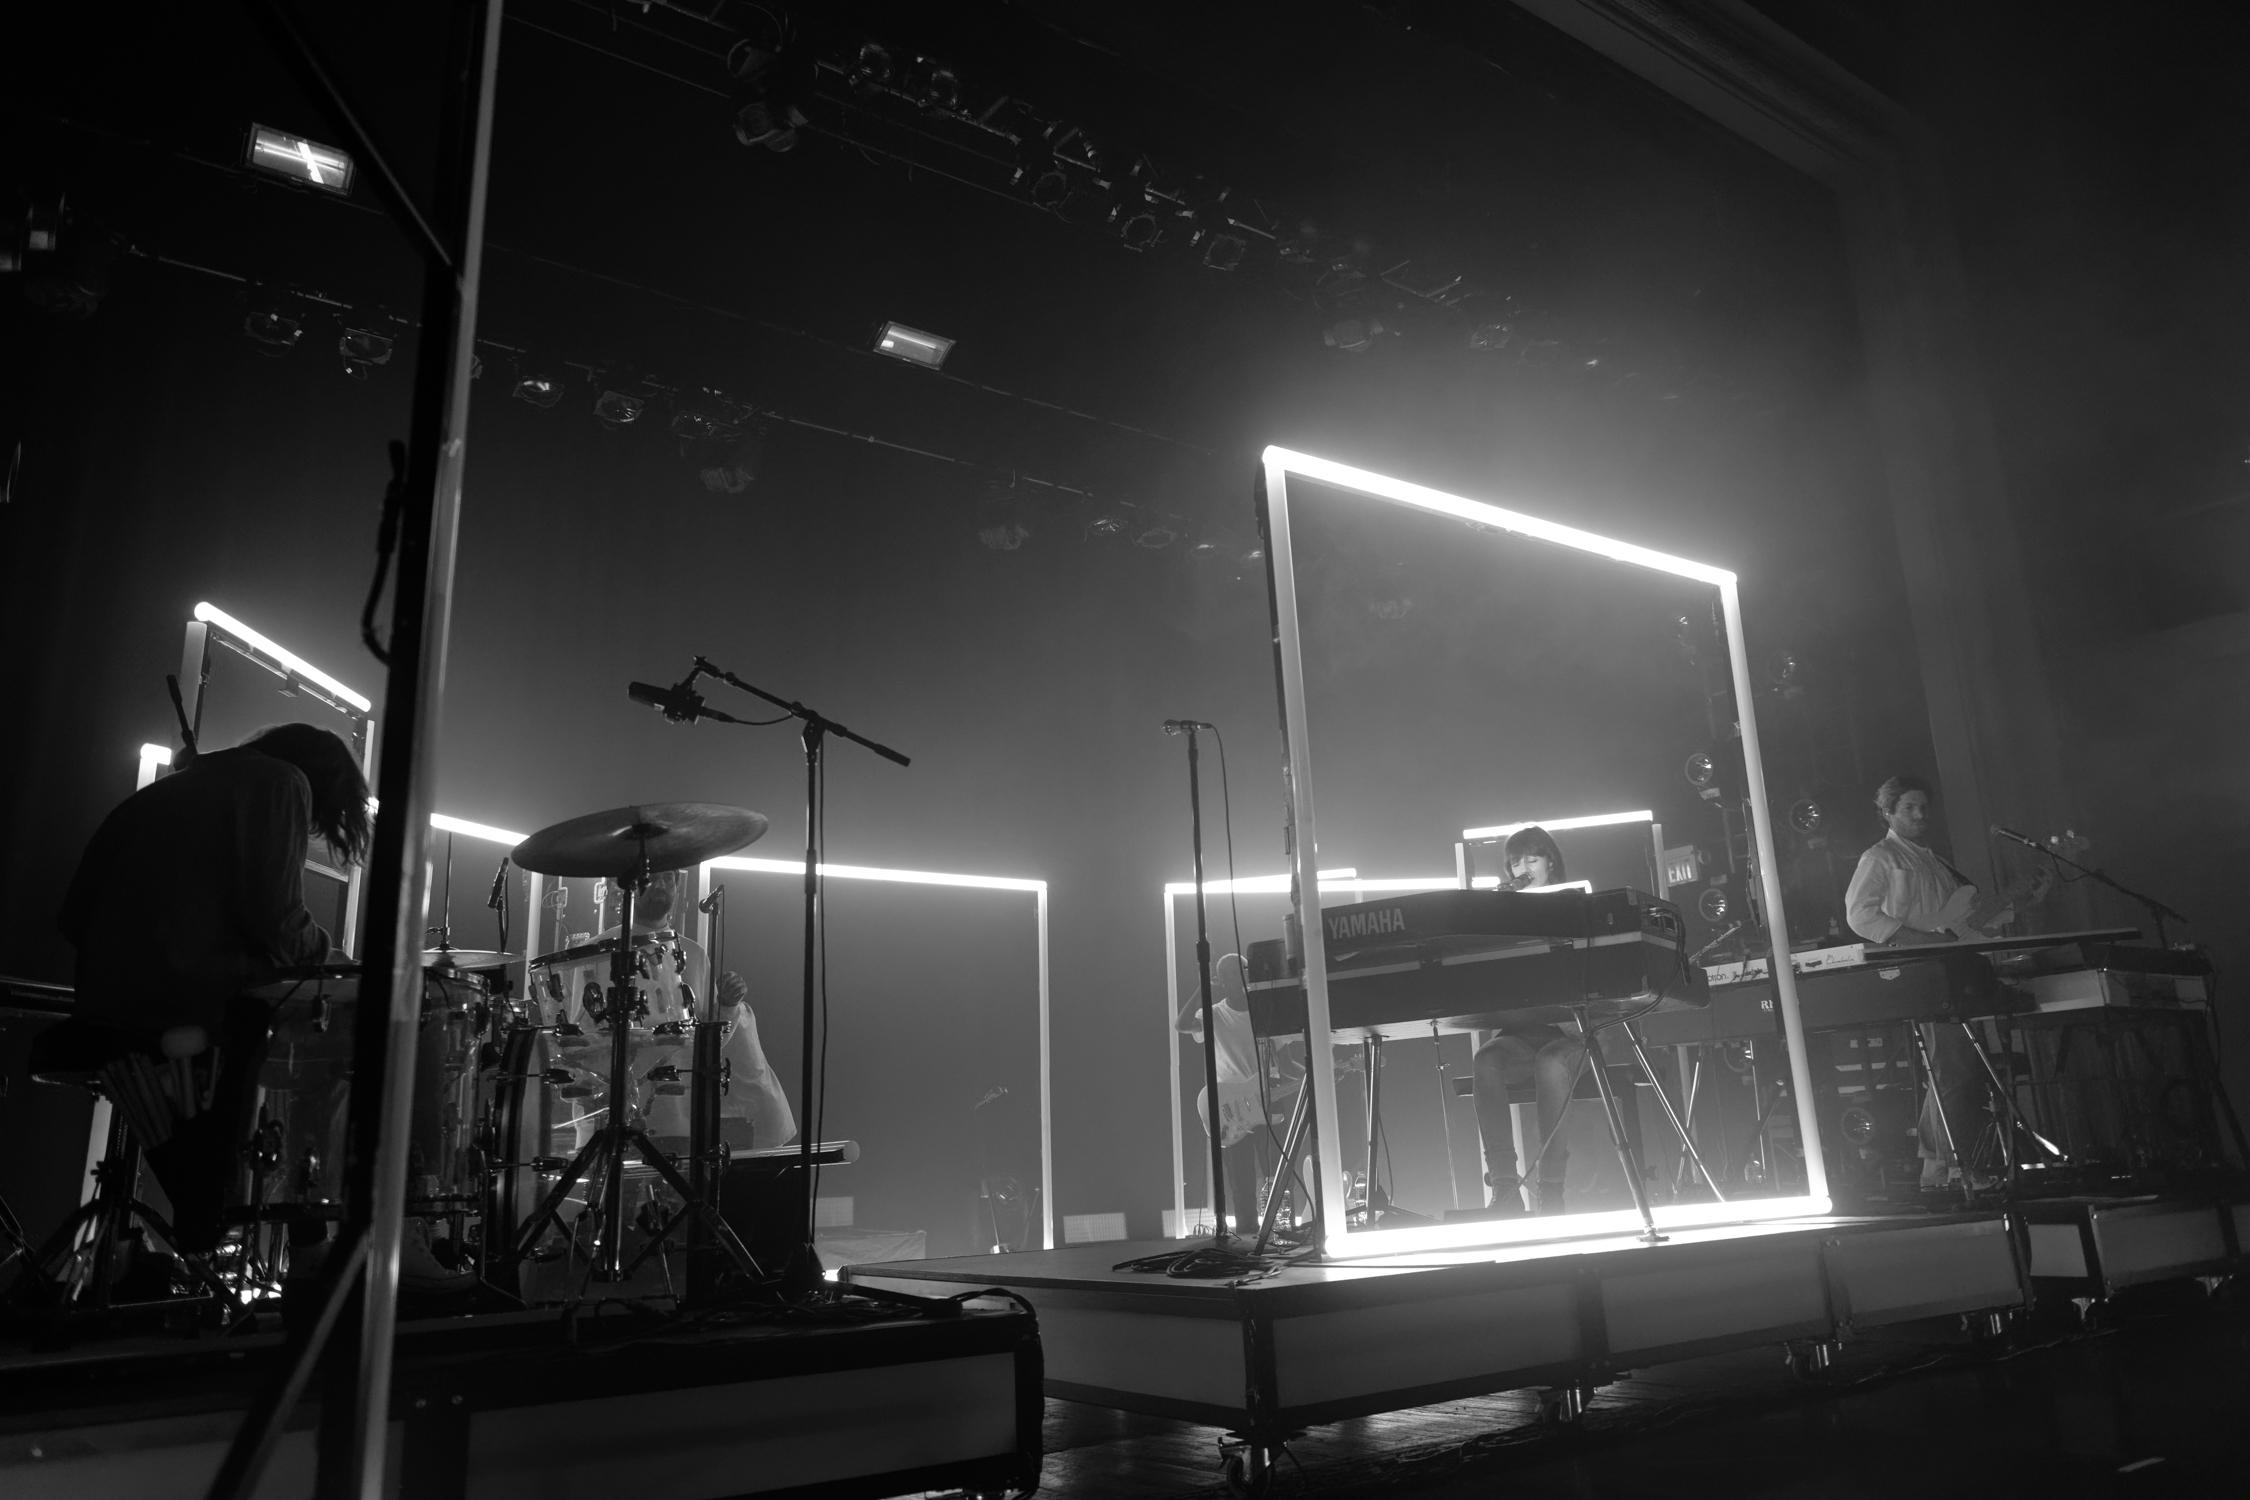 20190415 136 The Regency Ballroom - Charlotte Gainsbourg by Jon Bauer.jpg